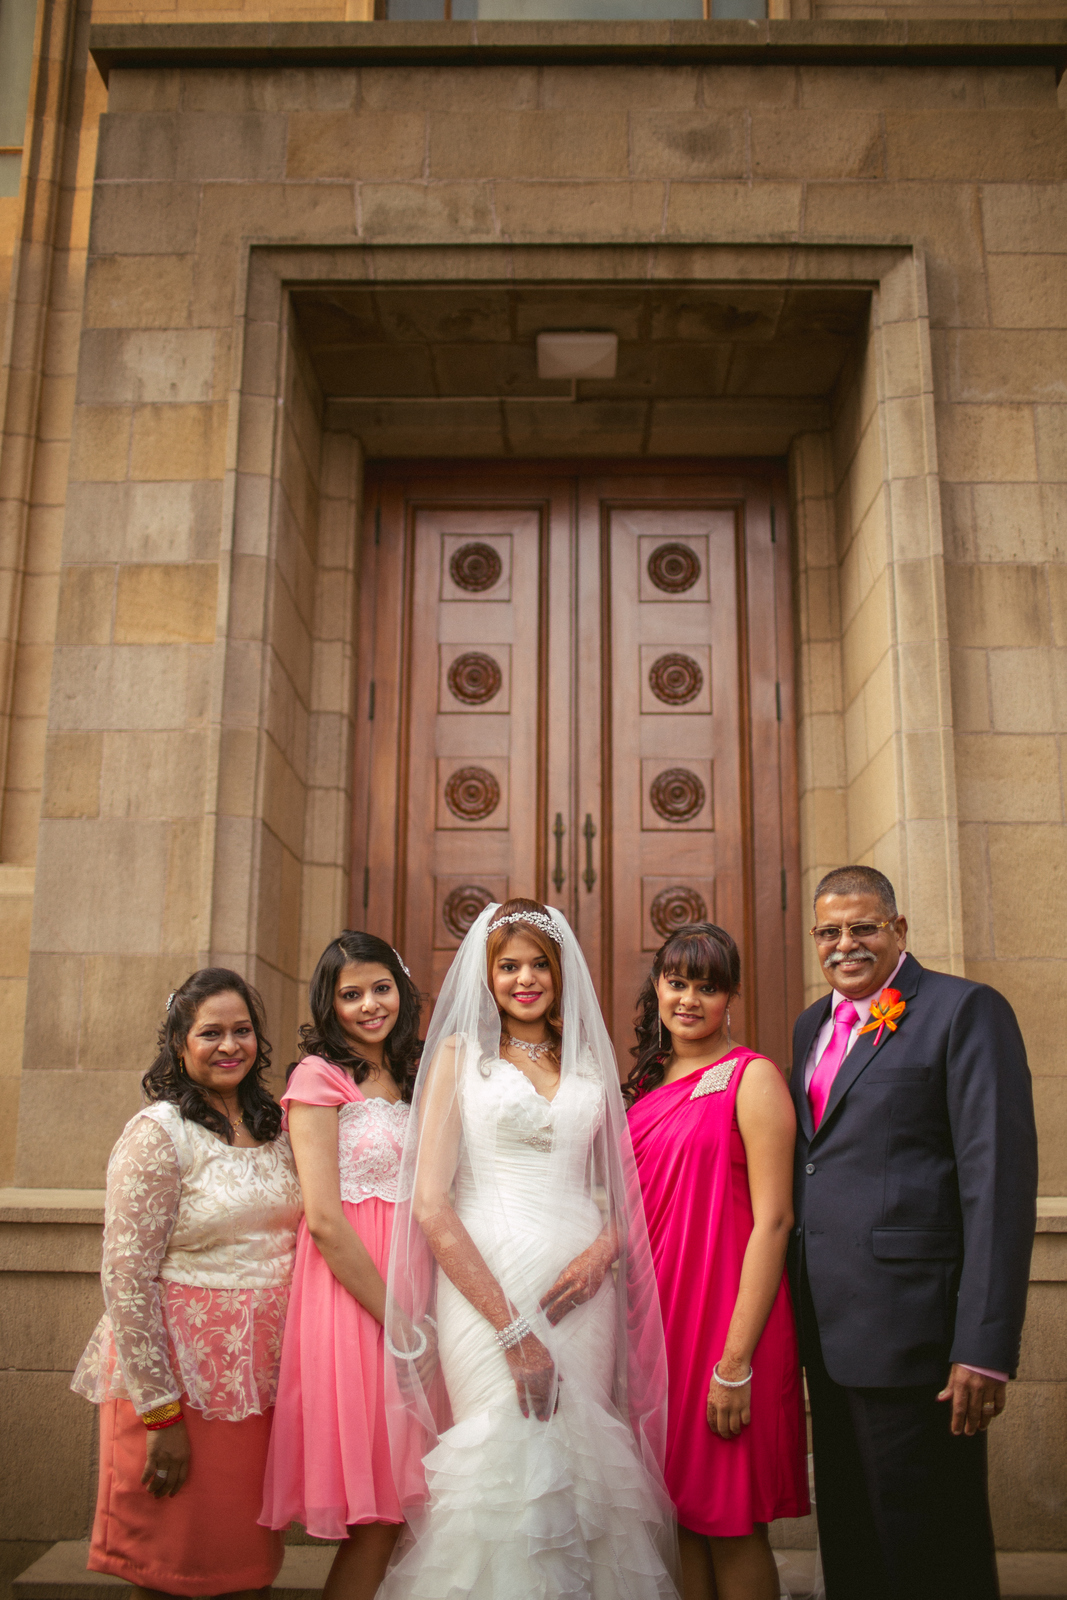 church-wedding-mumbai-into-candid-photography-3411.jpg